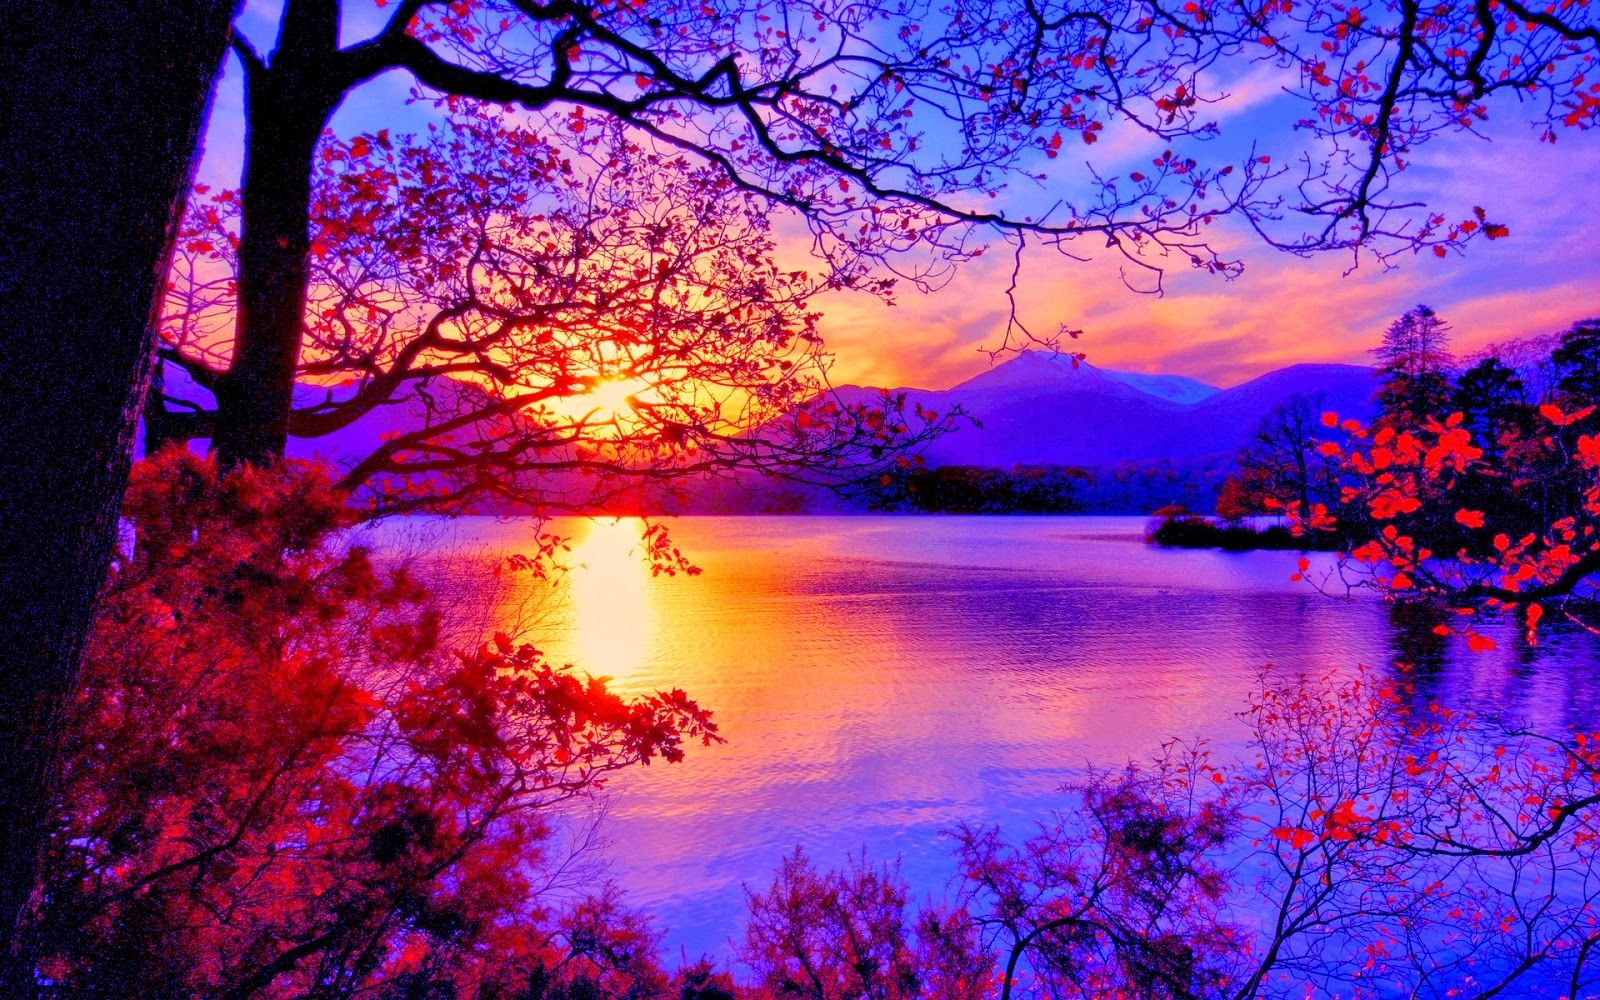 Wonderful Beautiful Scenery For Windows Wallpaper Full Hd With Beautiful Scenery Download Hd Wallpaper Jpg 1600 1000 Paesaggi Tramonti Luoghi Meravigliosi